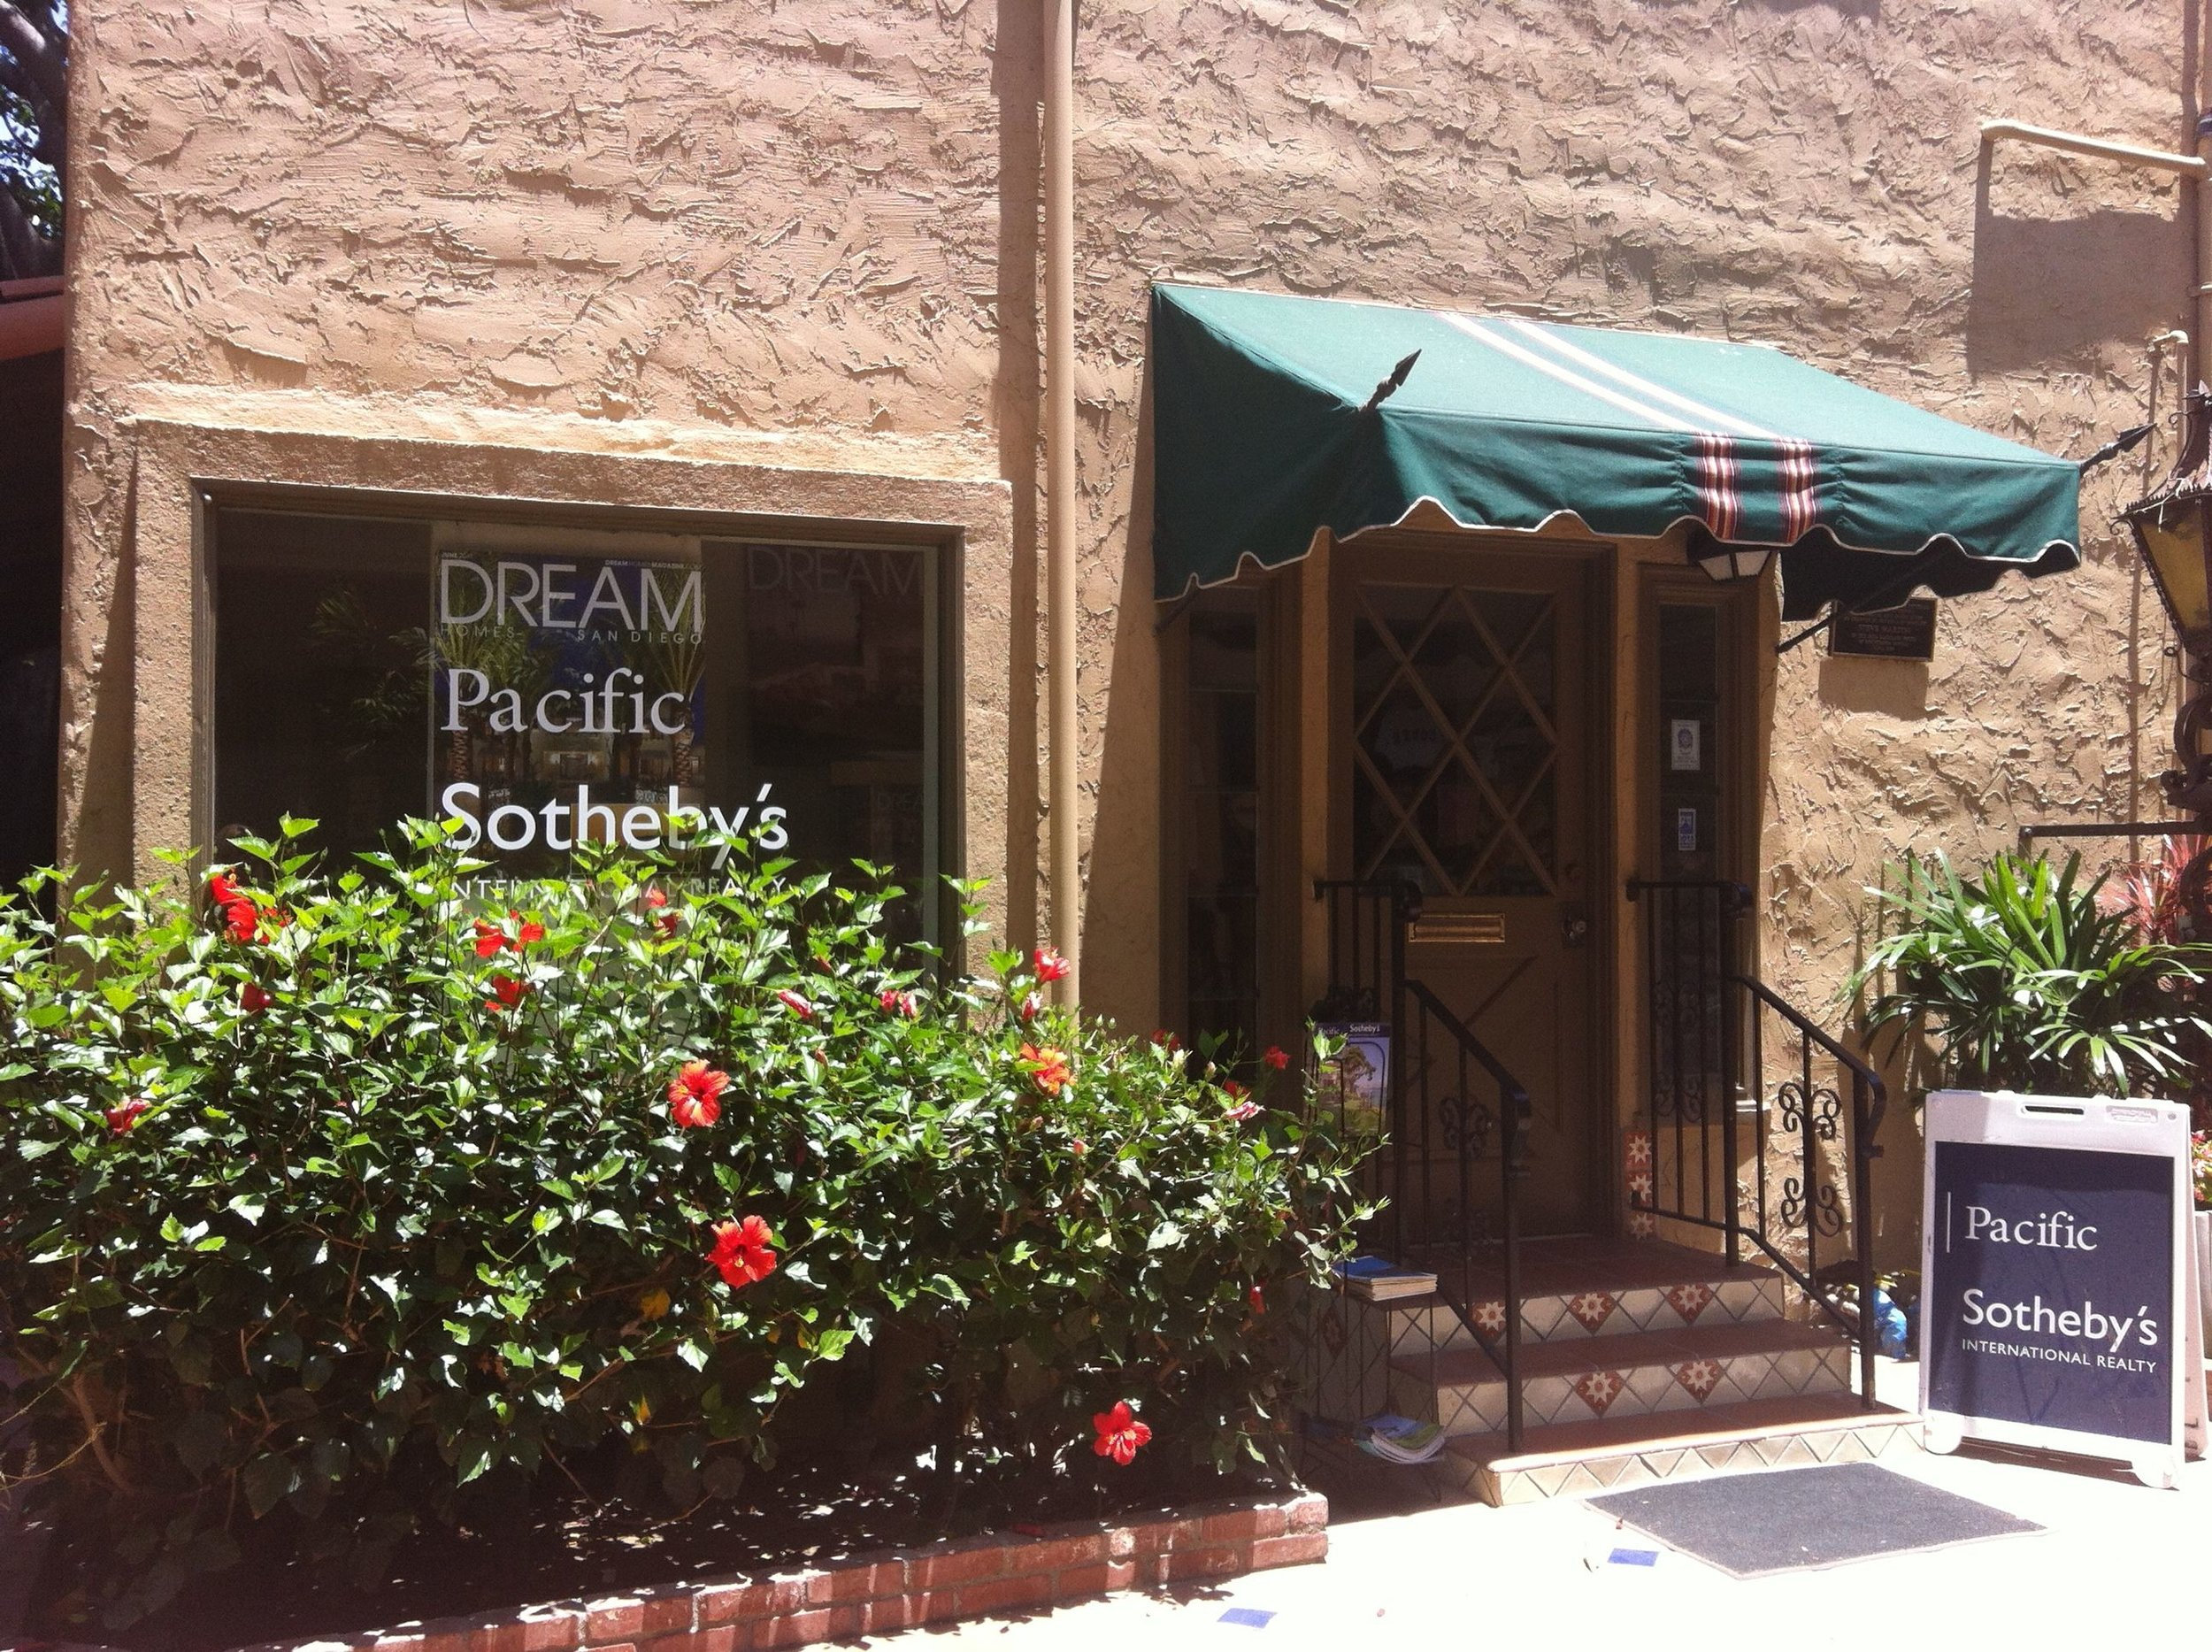 Coronado   1339 Orange Avenue, Suite 8  Coronado, California 92118  619.437.1614  Languages: English, Spanish